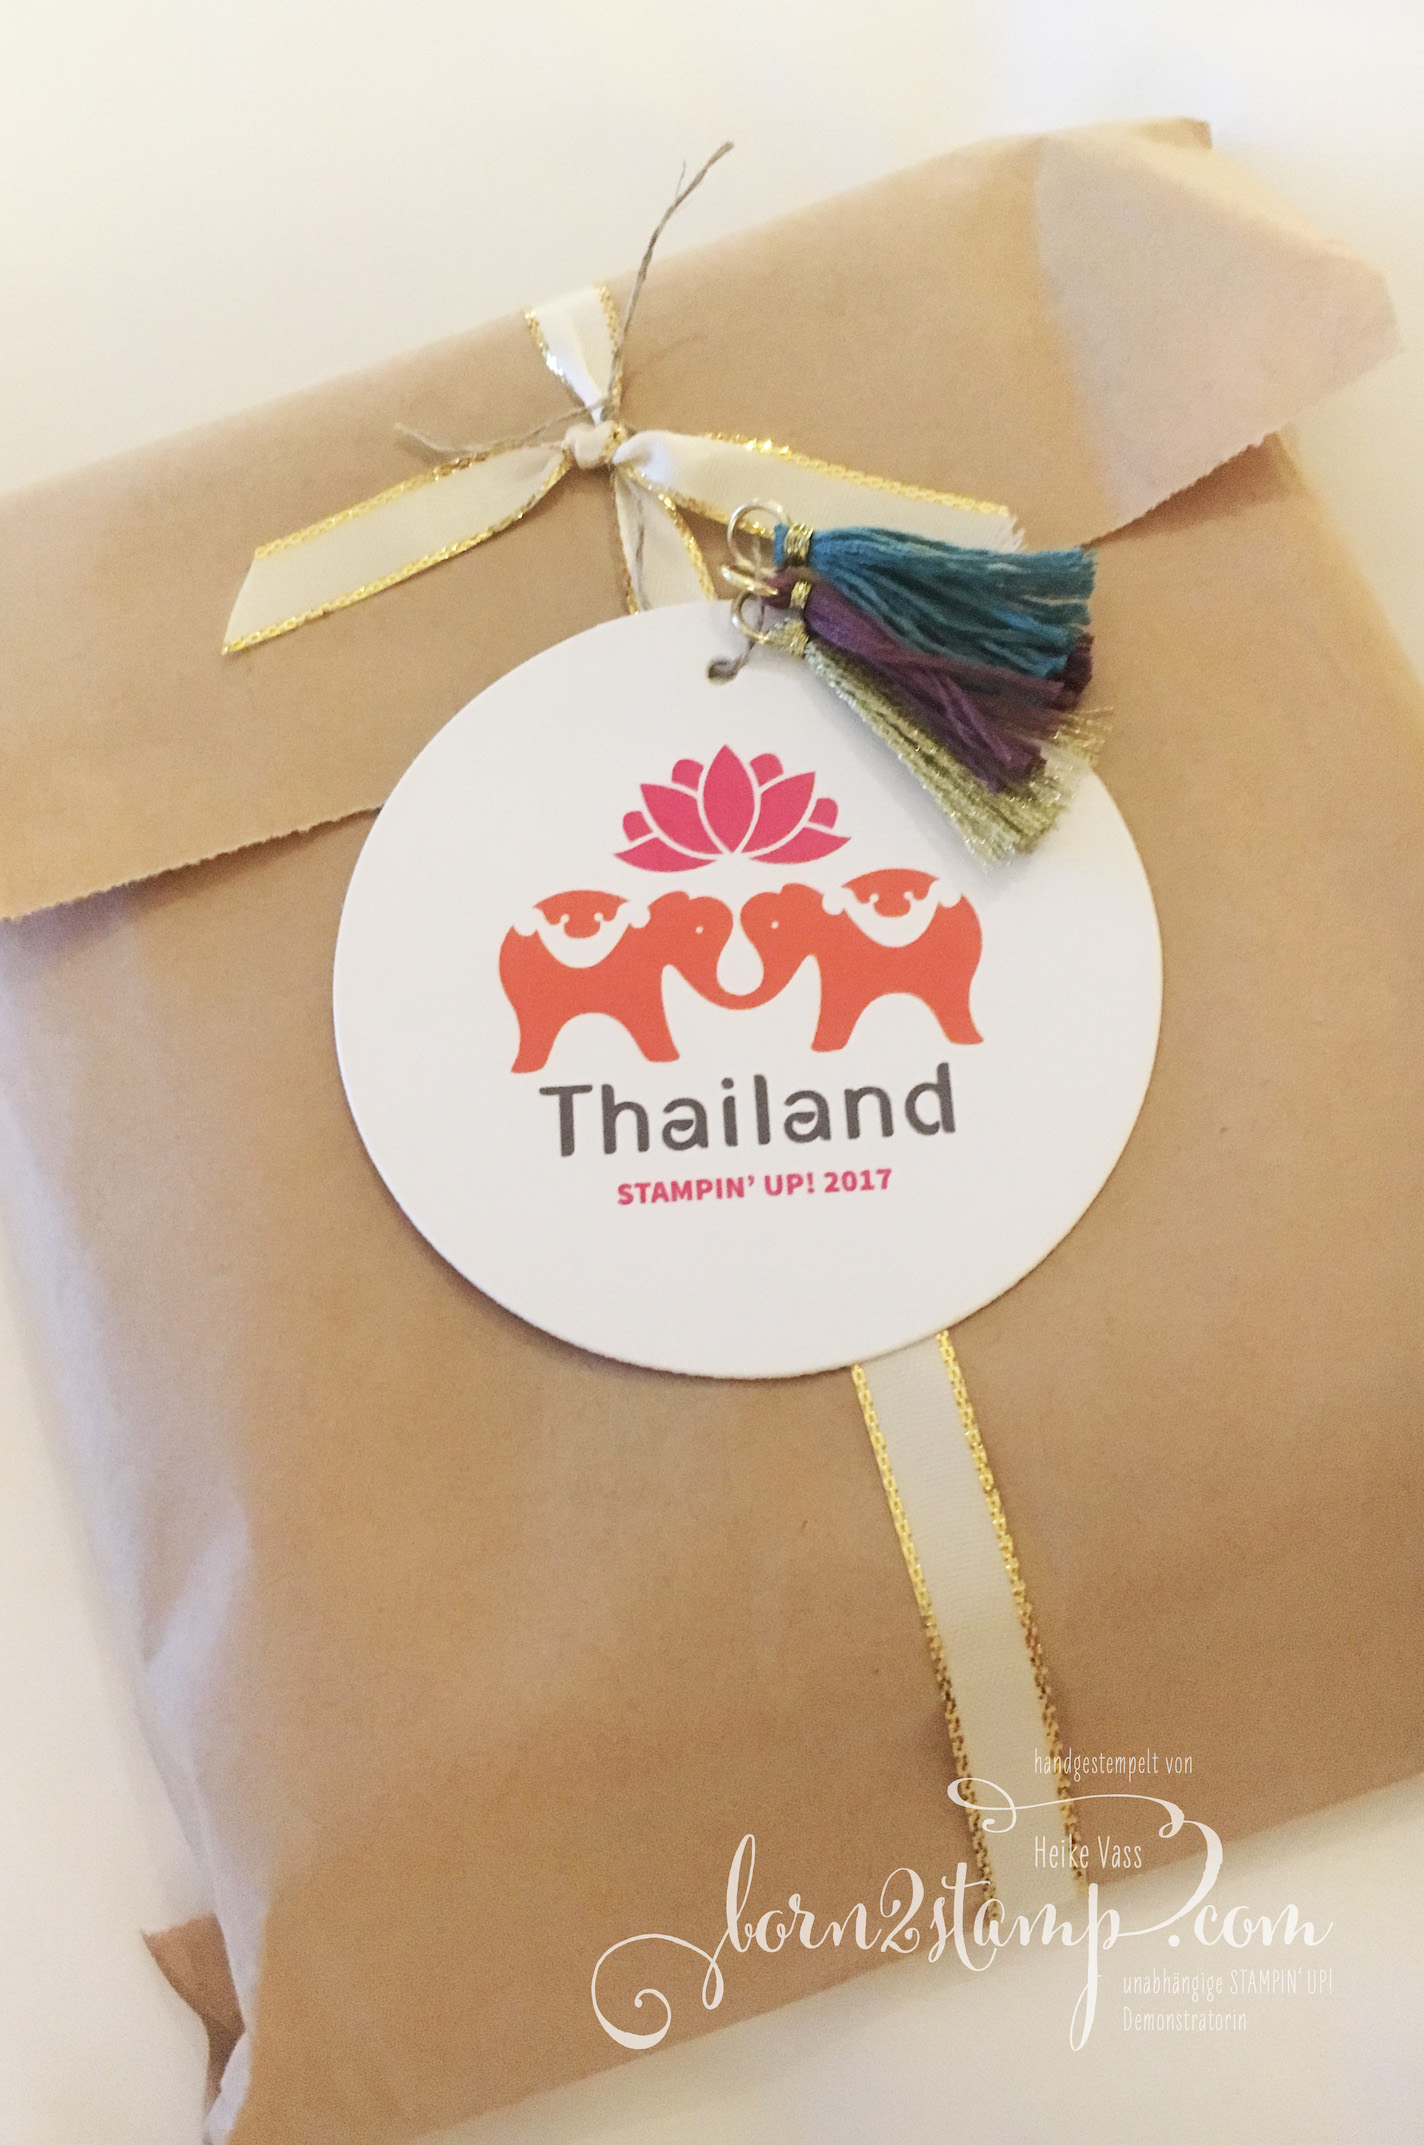 STAMPIN' UP! born2stamp Prämienreise Thailand – Pillow gift 2